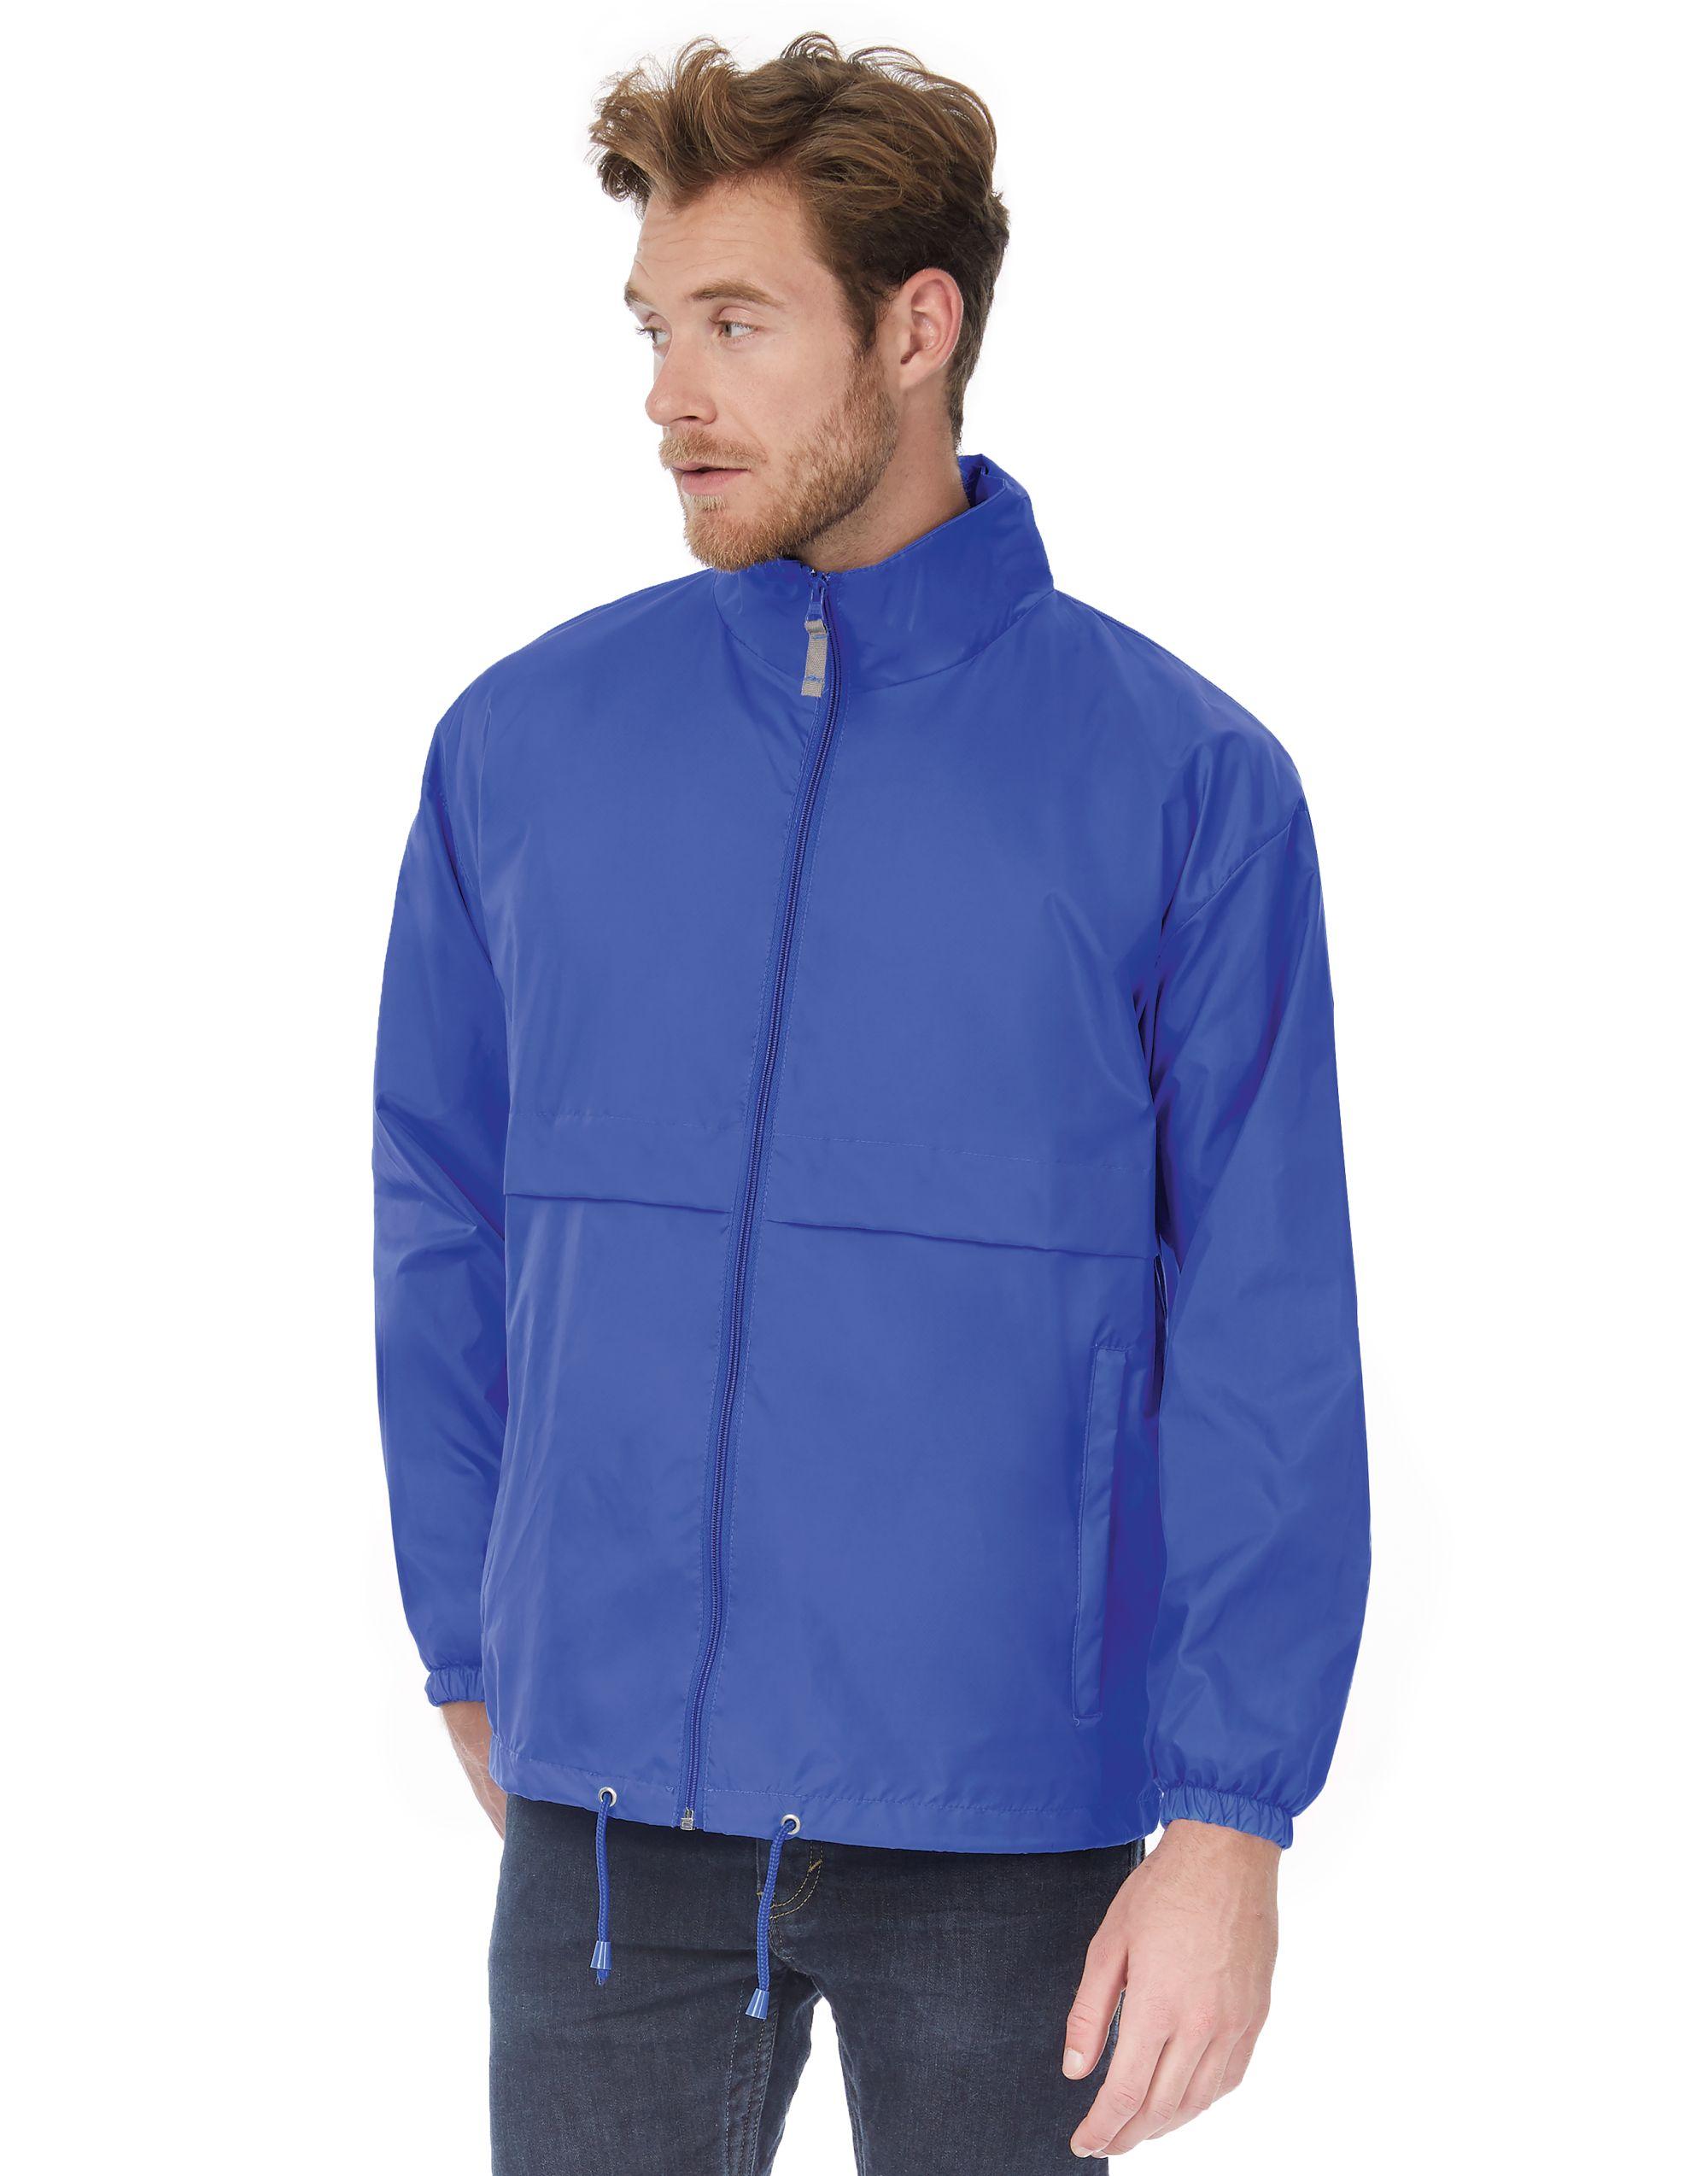 B&C Men's Air Windbreaker Jacket